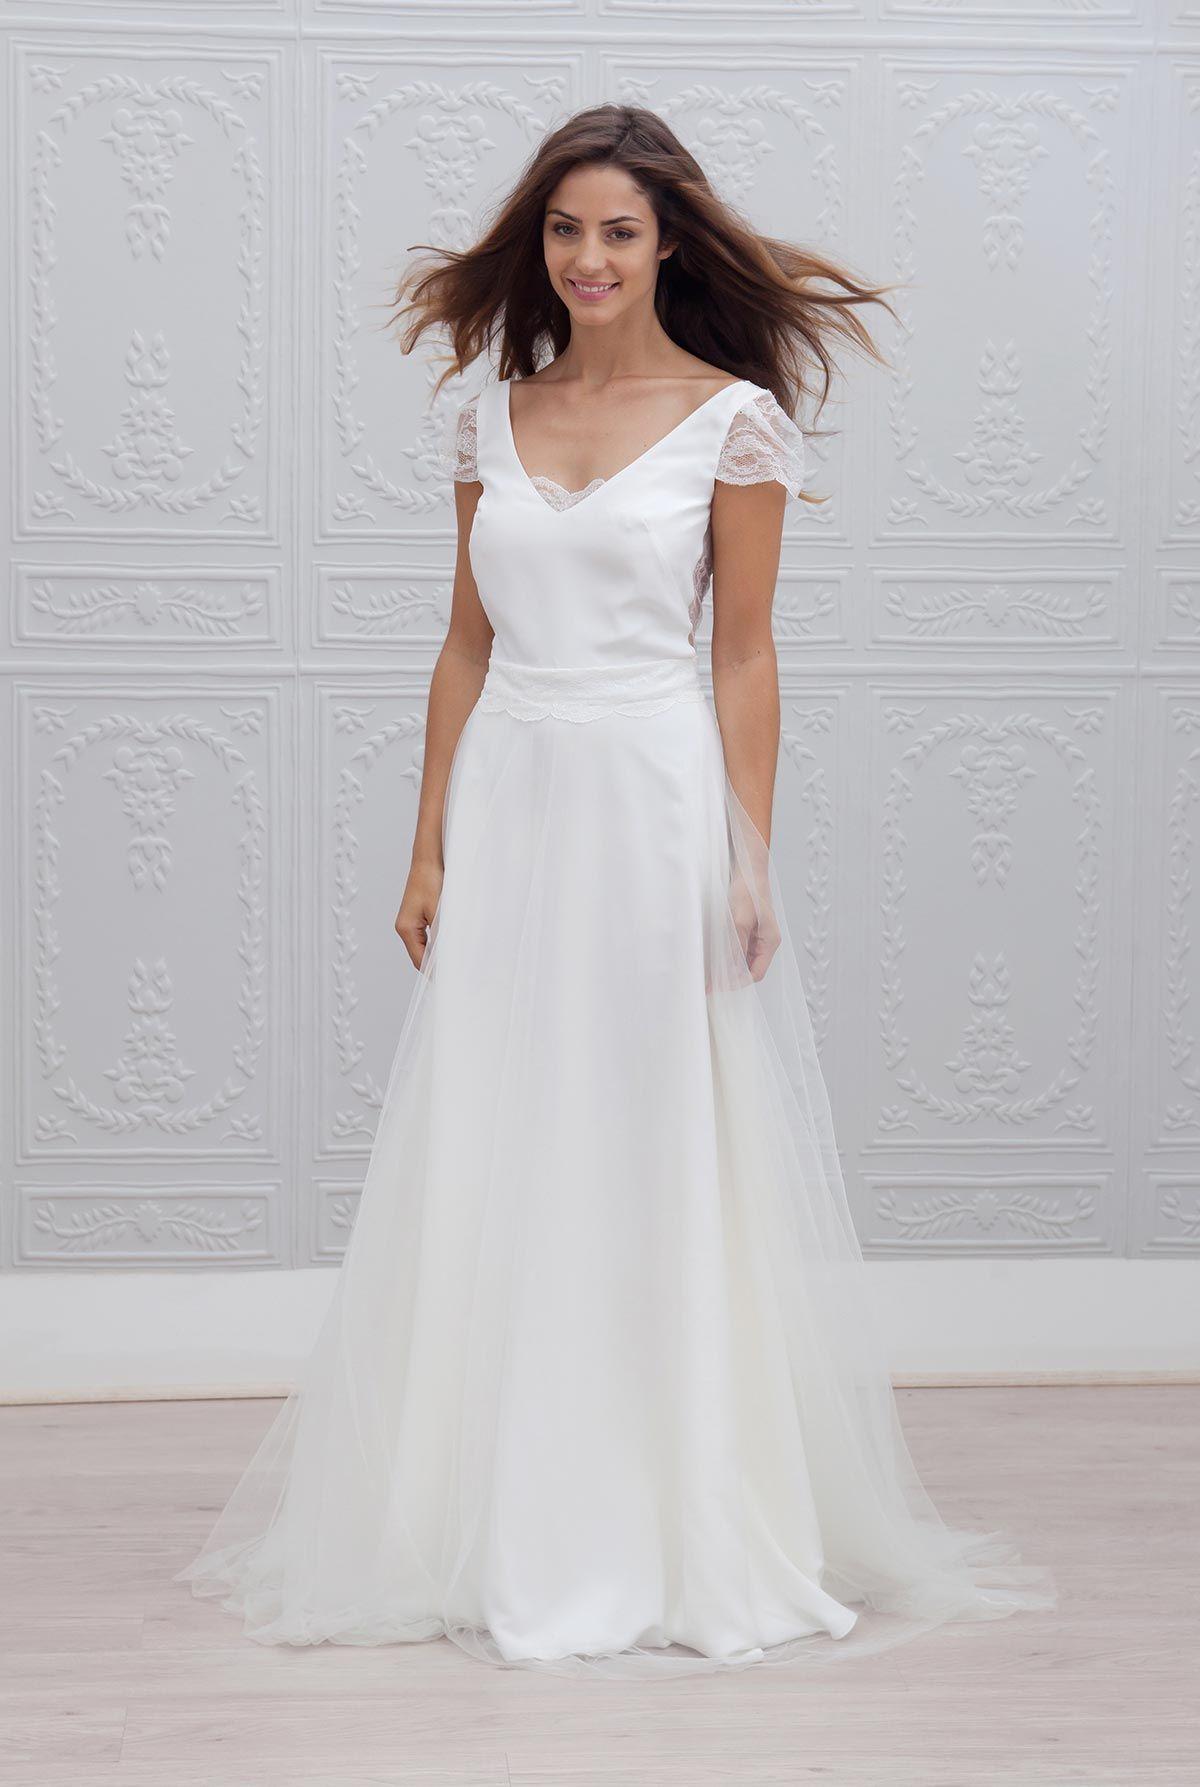 Esther marie laporte wedding pinterest wedding dress esther marie laporte ombrellifo Images